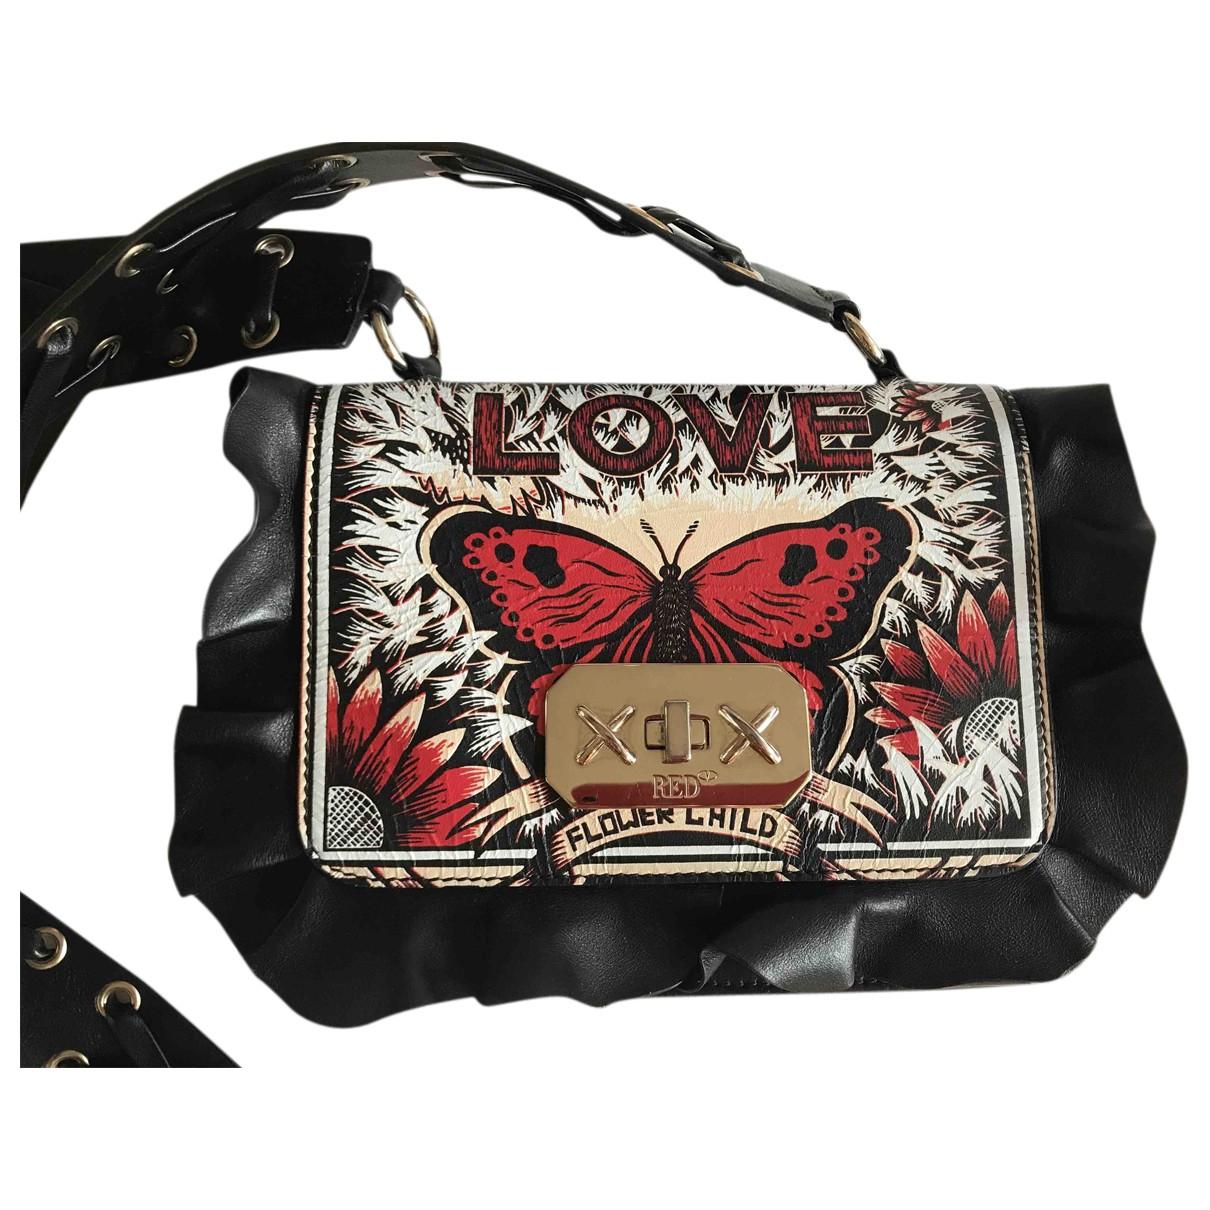 Red Valentino Garavani N Black Leather handbag for Women N